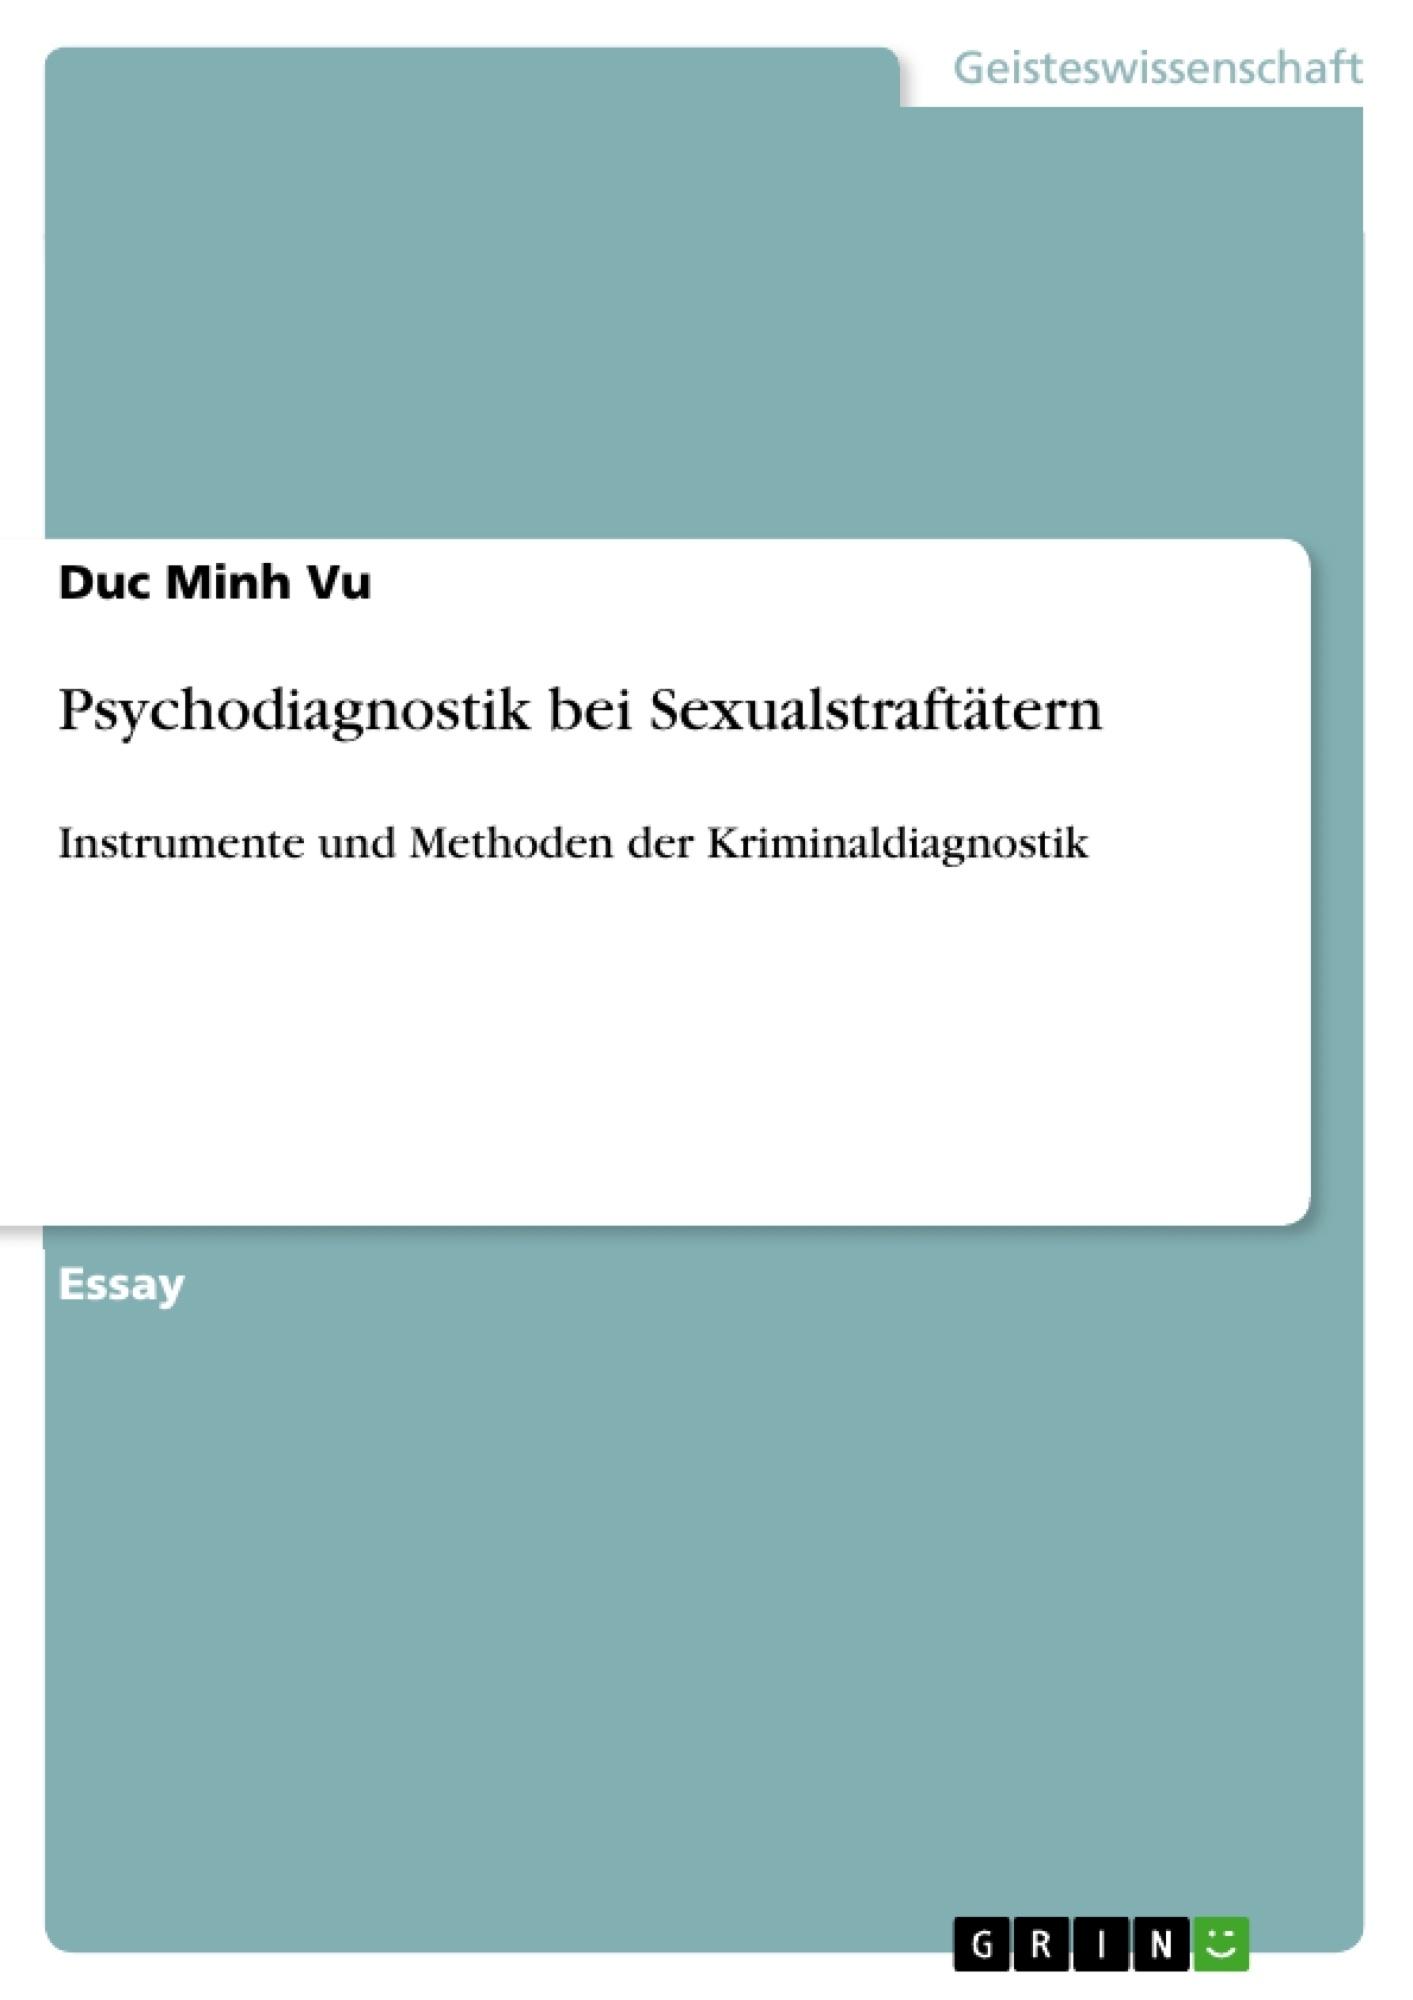 Titel: Psychodiagnostik bei Sexualstraftätern